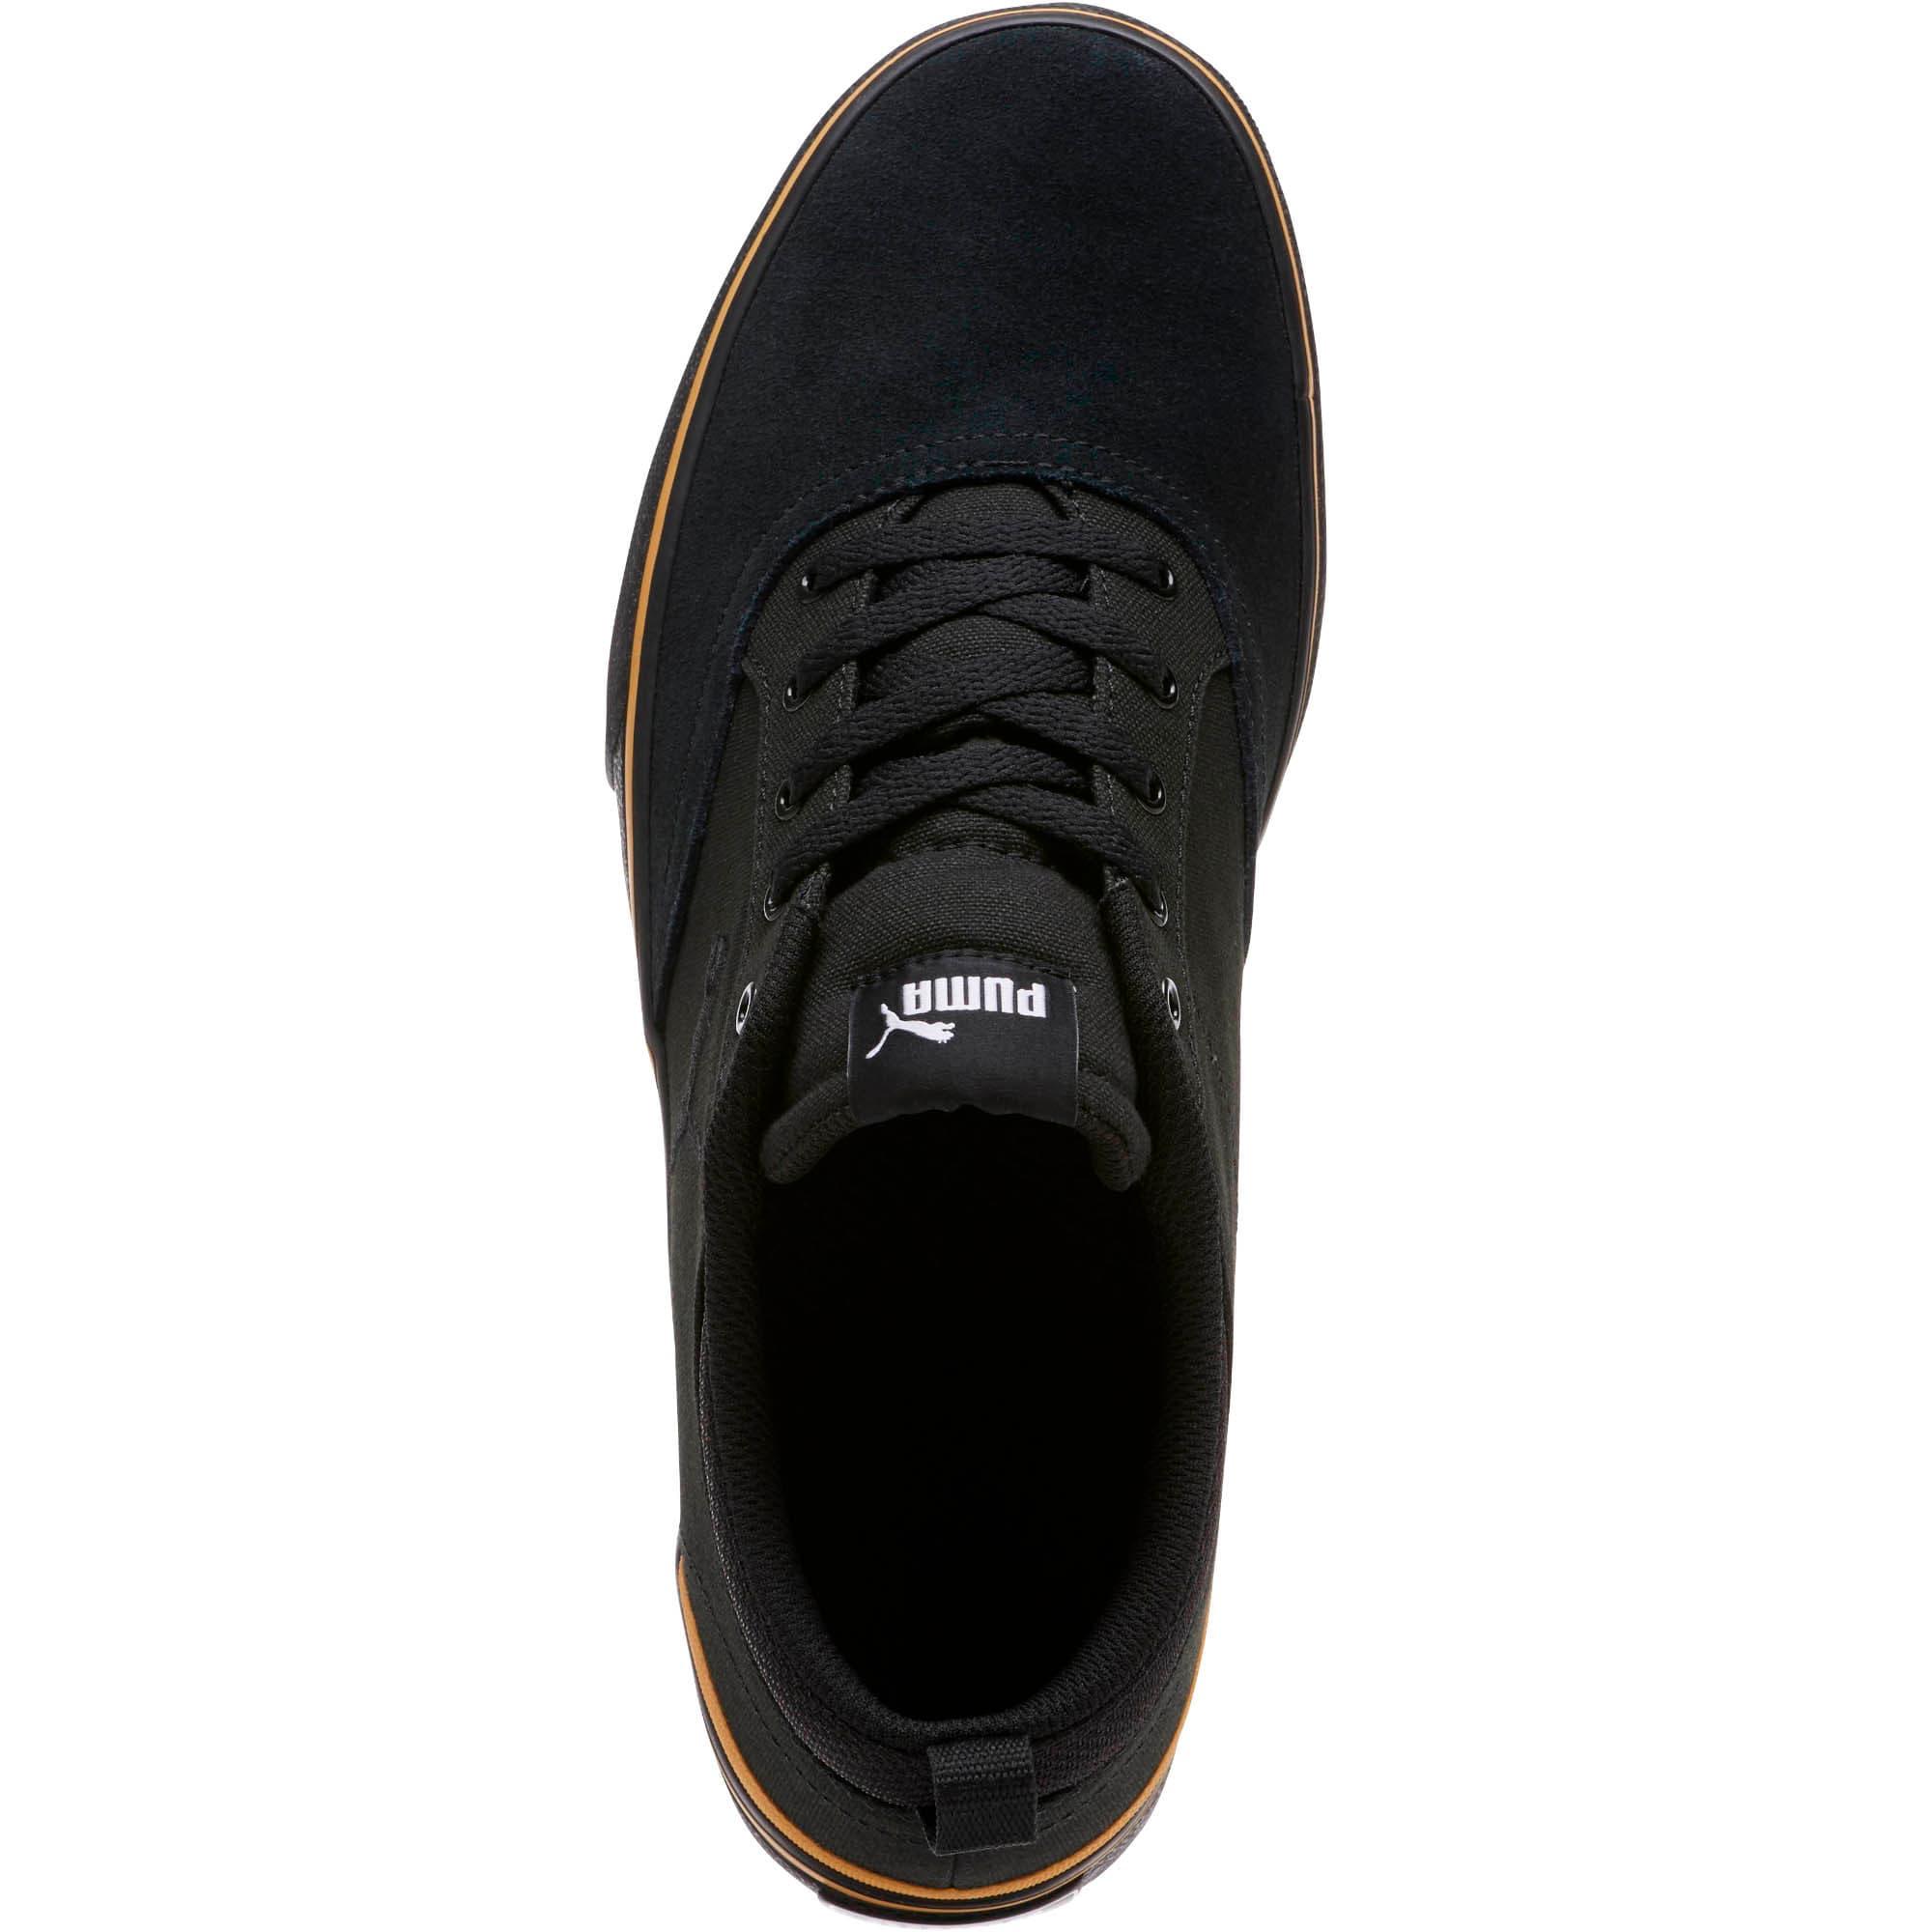 Thumbnail 5 of Puma Bridger Cat Men's Sneakers, Puma Black-Asphalt, medium